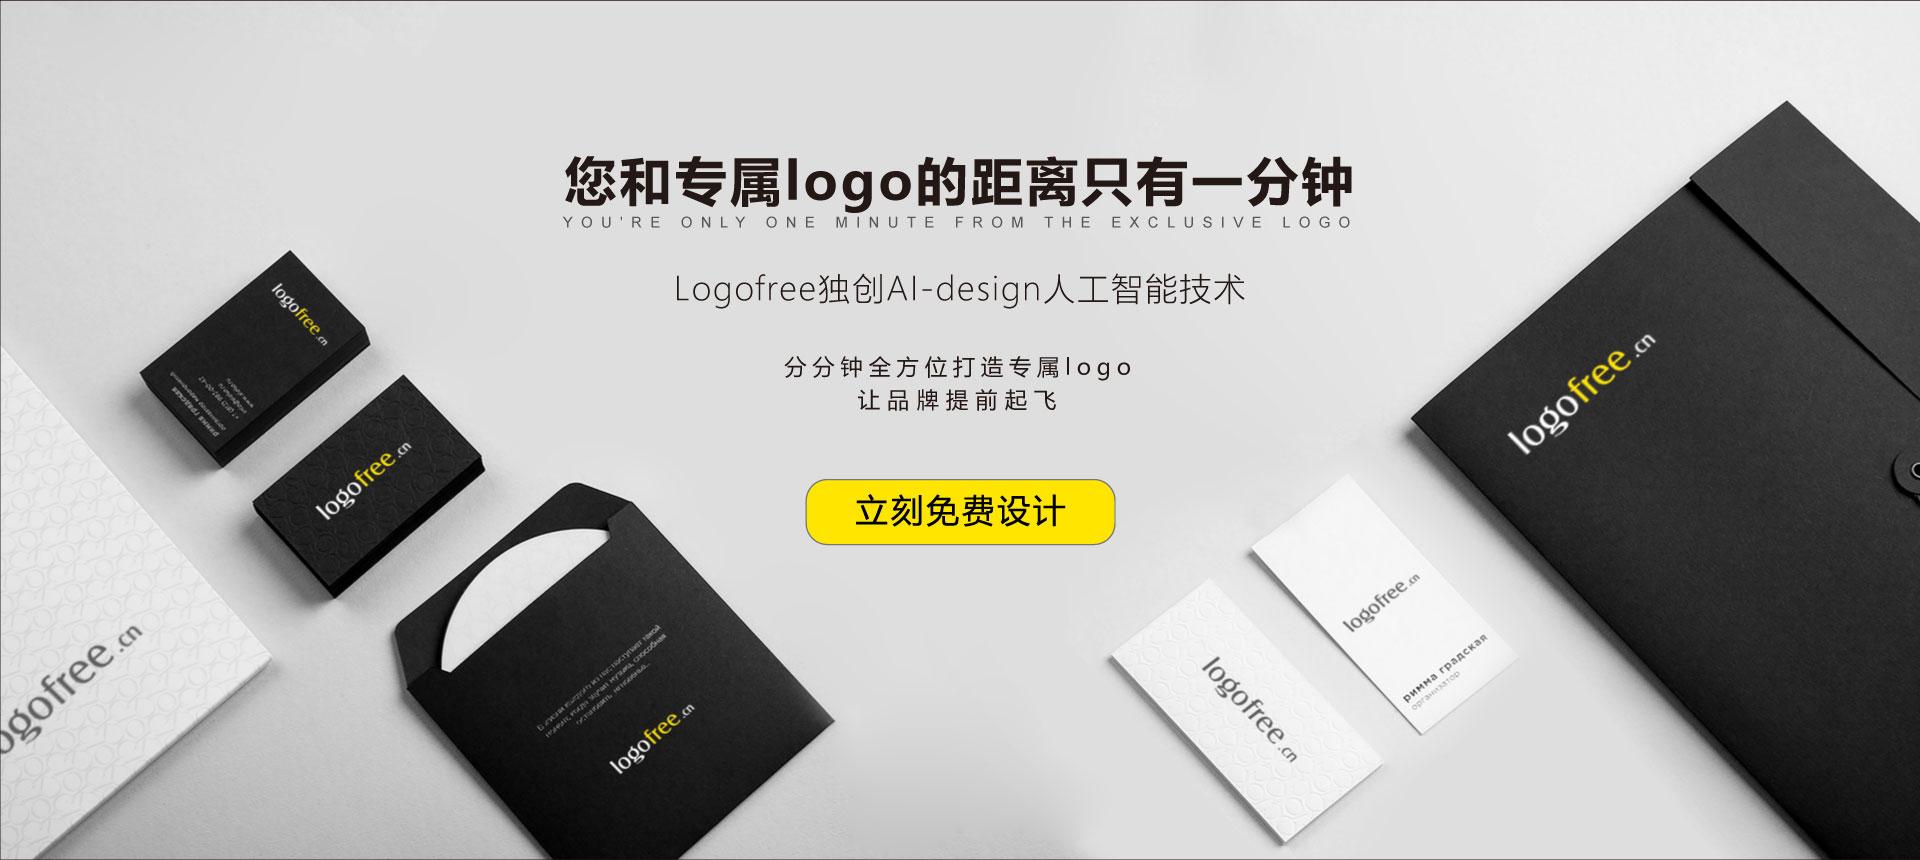 logofree,logo在线制作工具